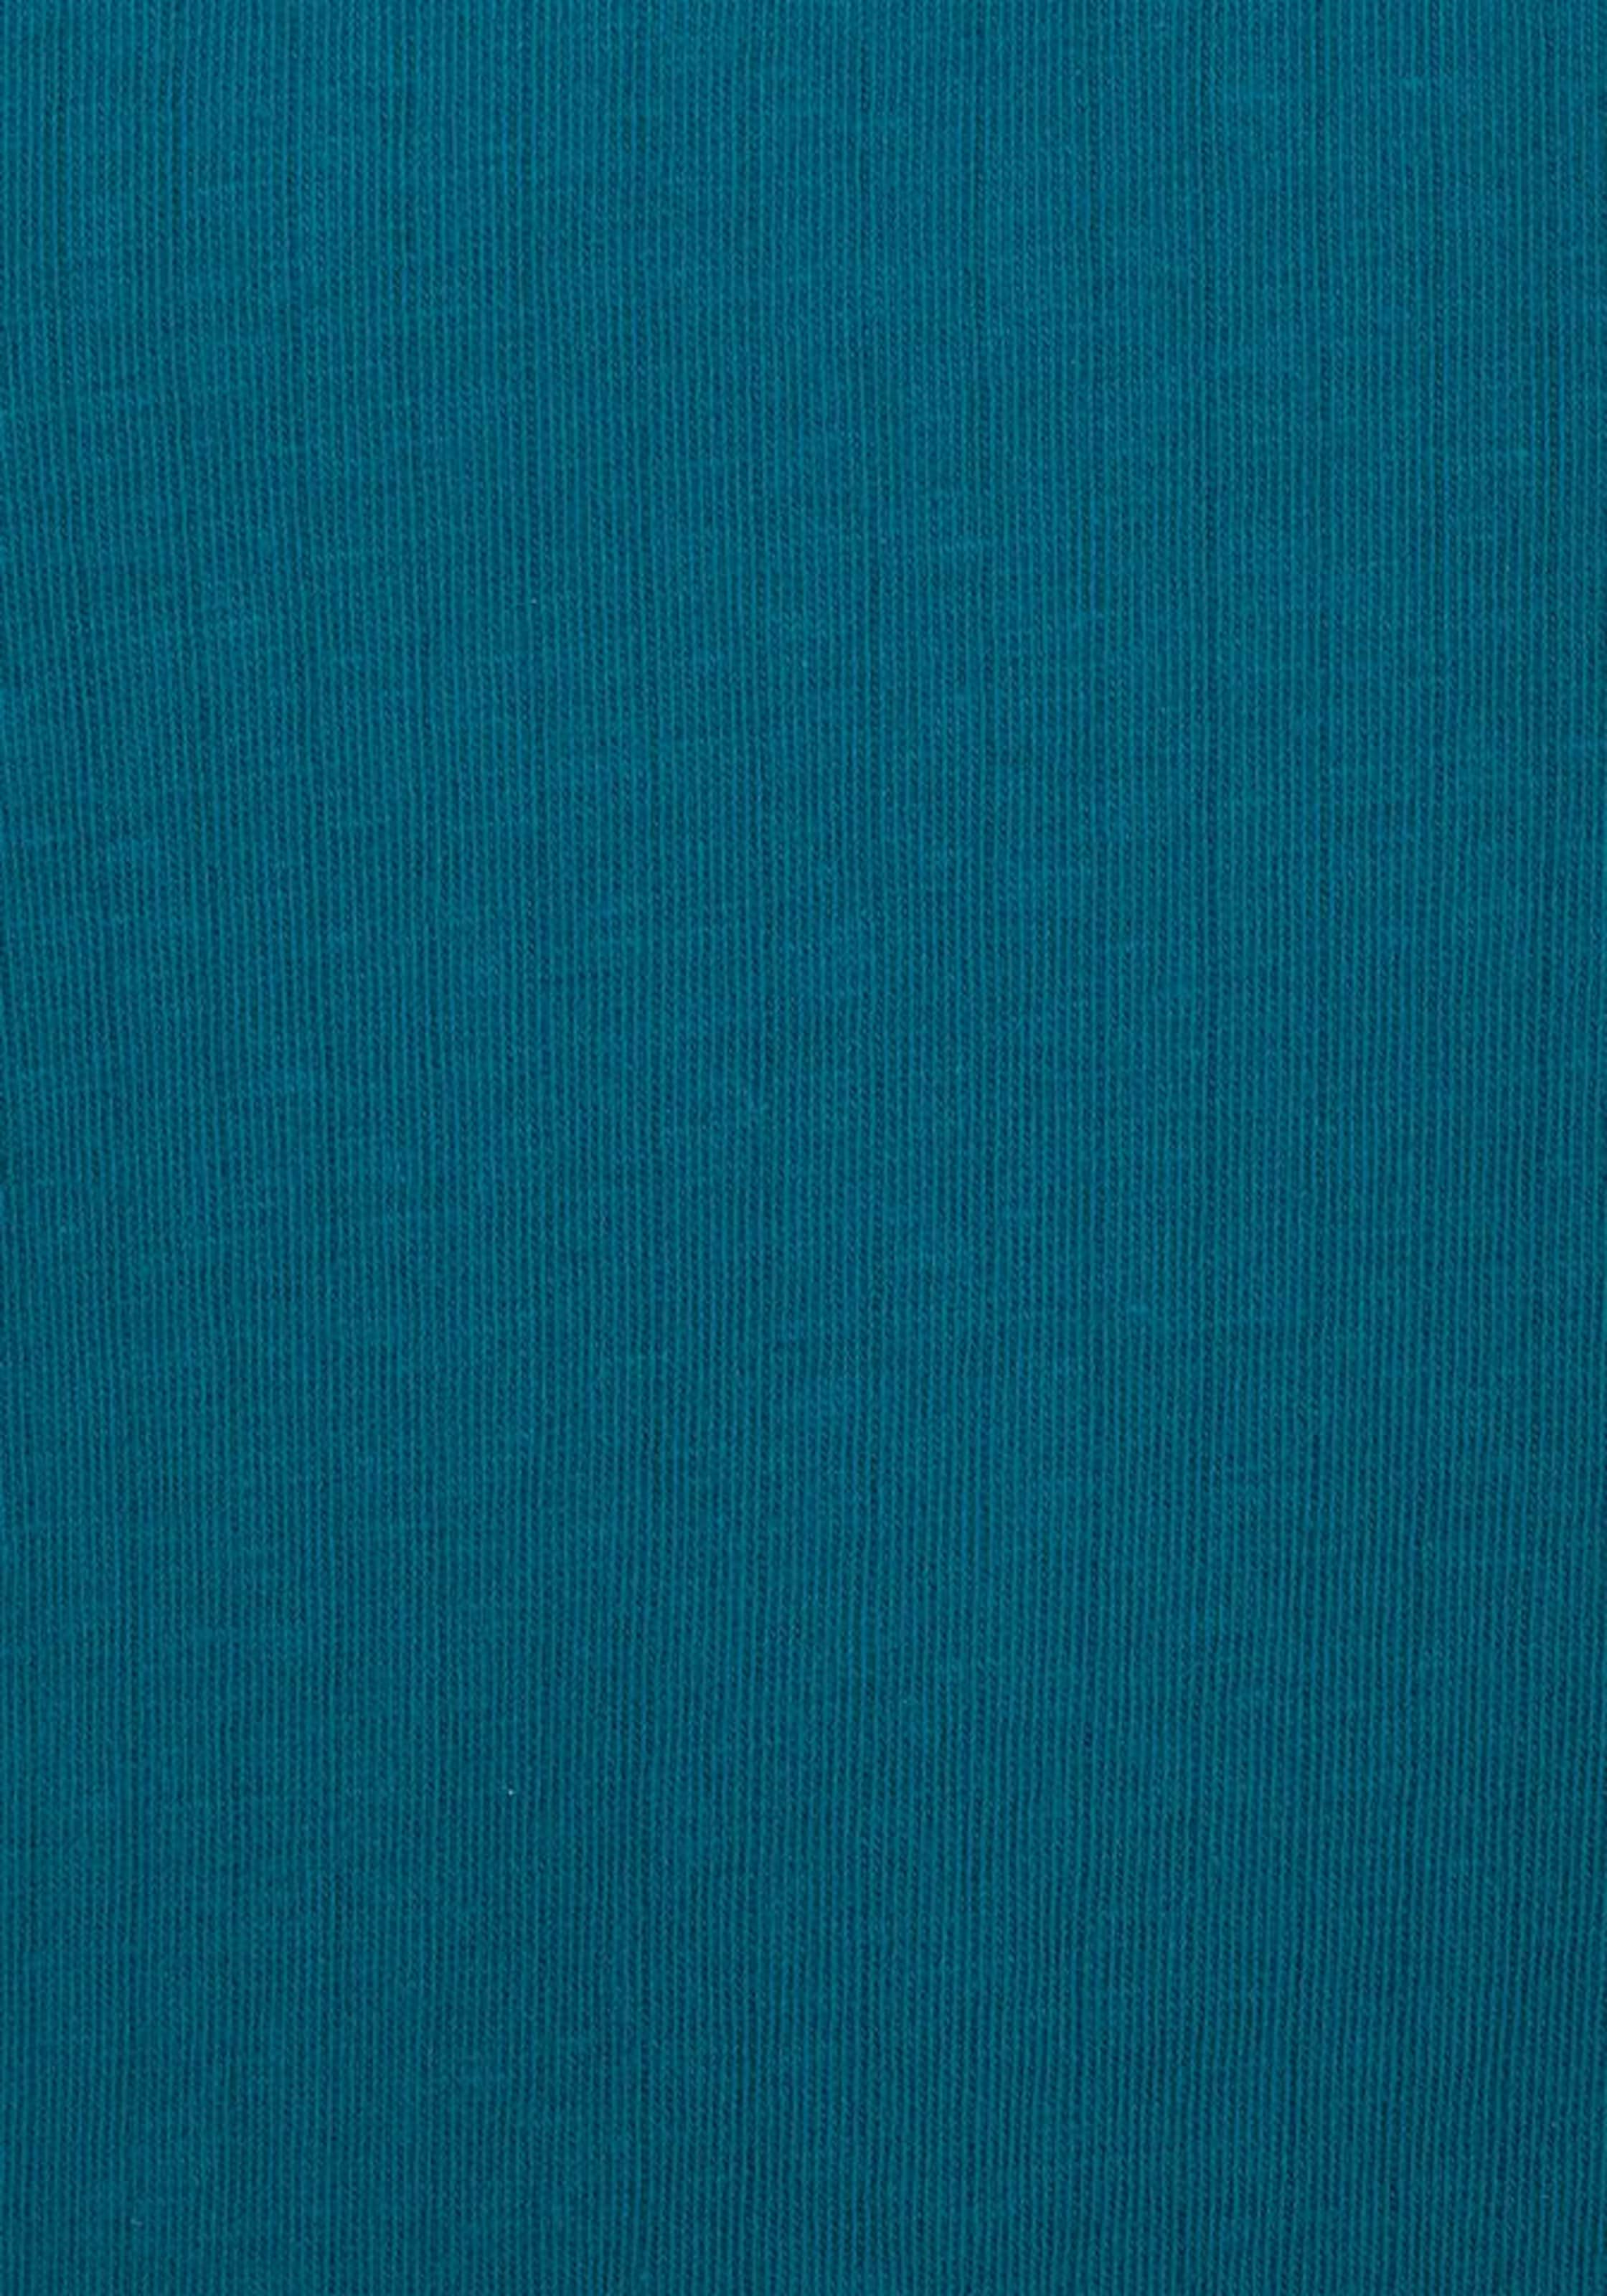 s.Oliver RED LABEL Bodywear V-Shirts (2 Stück), in hochwertiger Rippoptik